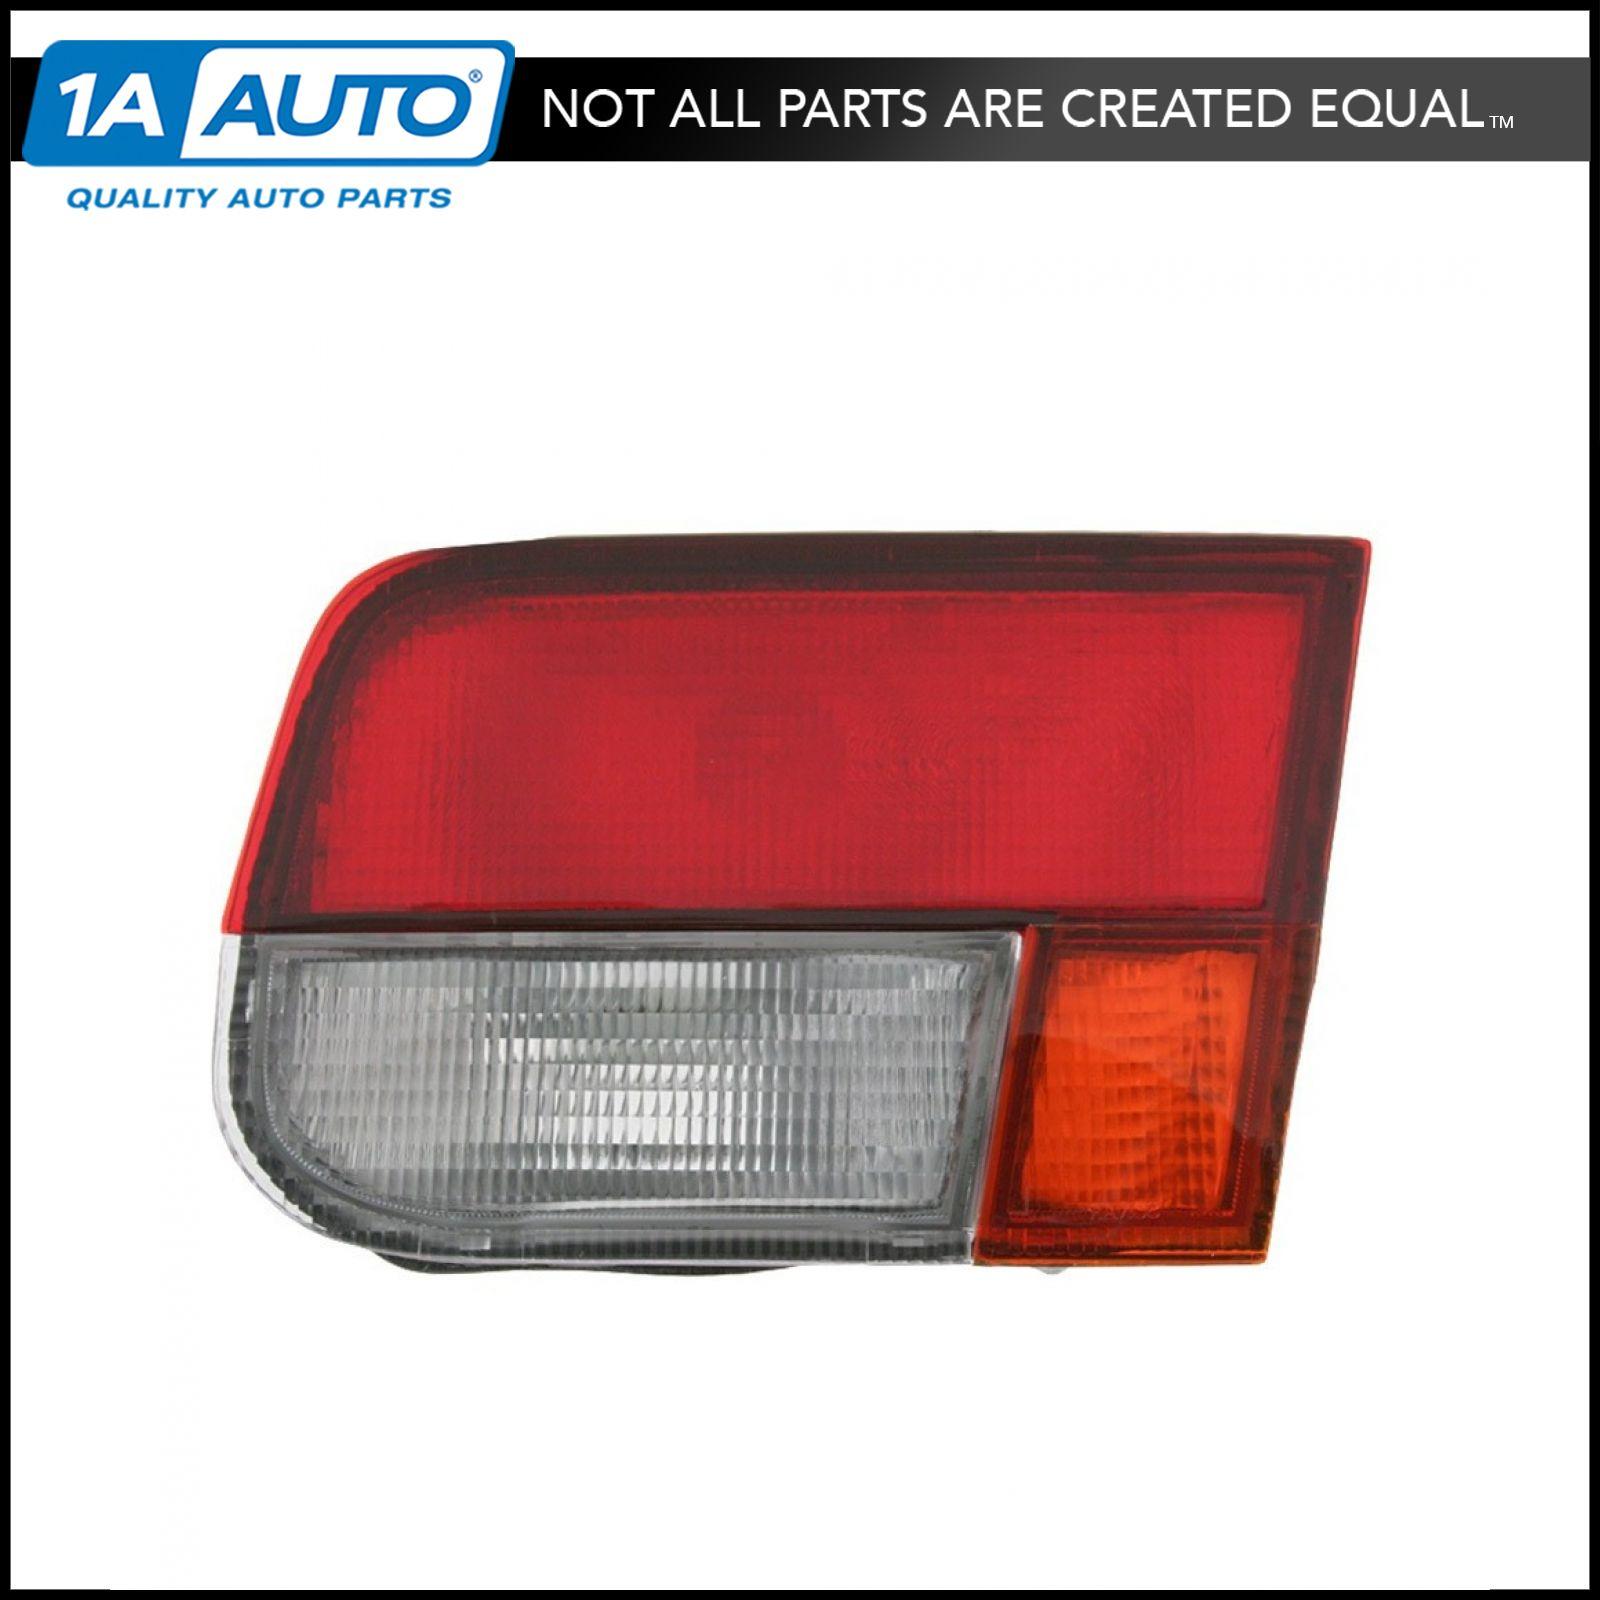 Rear Brake Light Taillight Lamp Left LH Driver Side for 96-98 Honda Civic Coupe